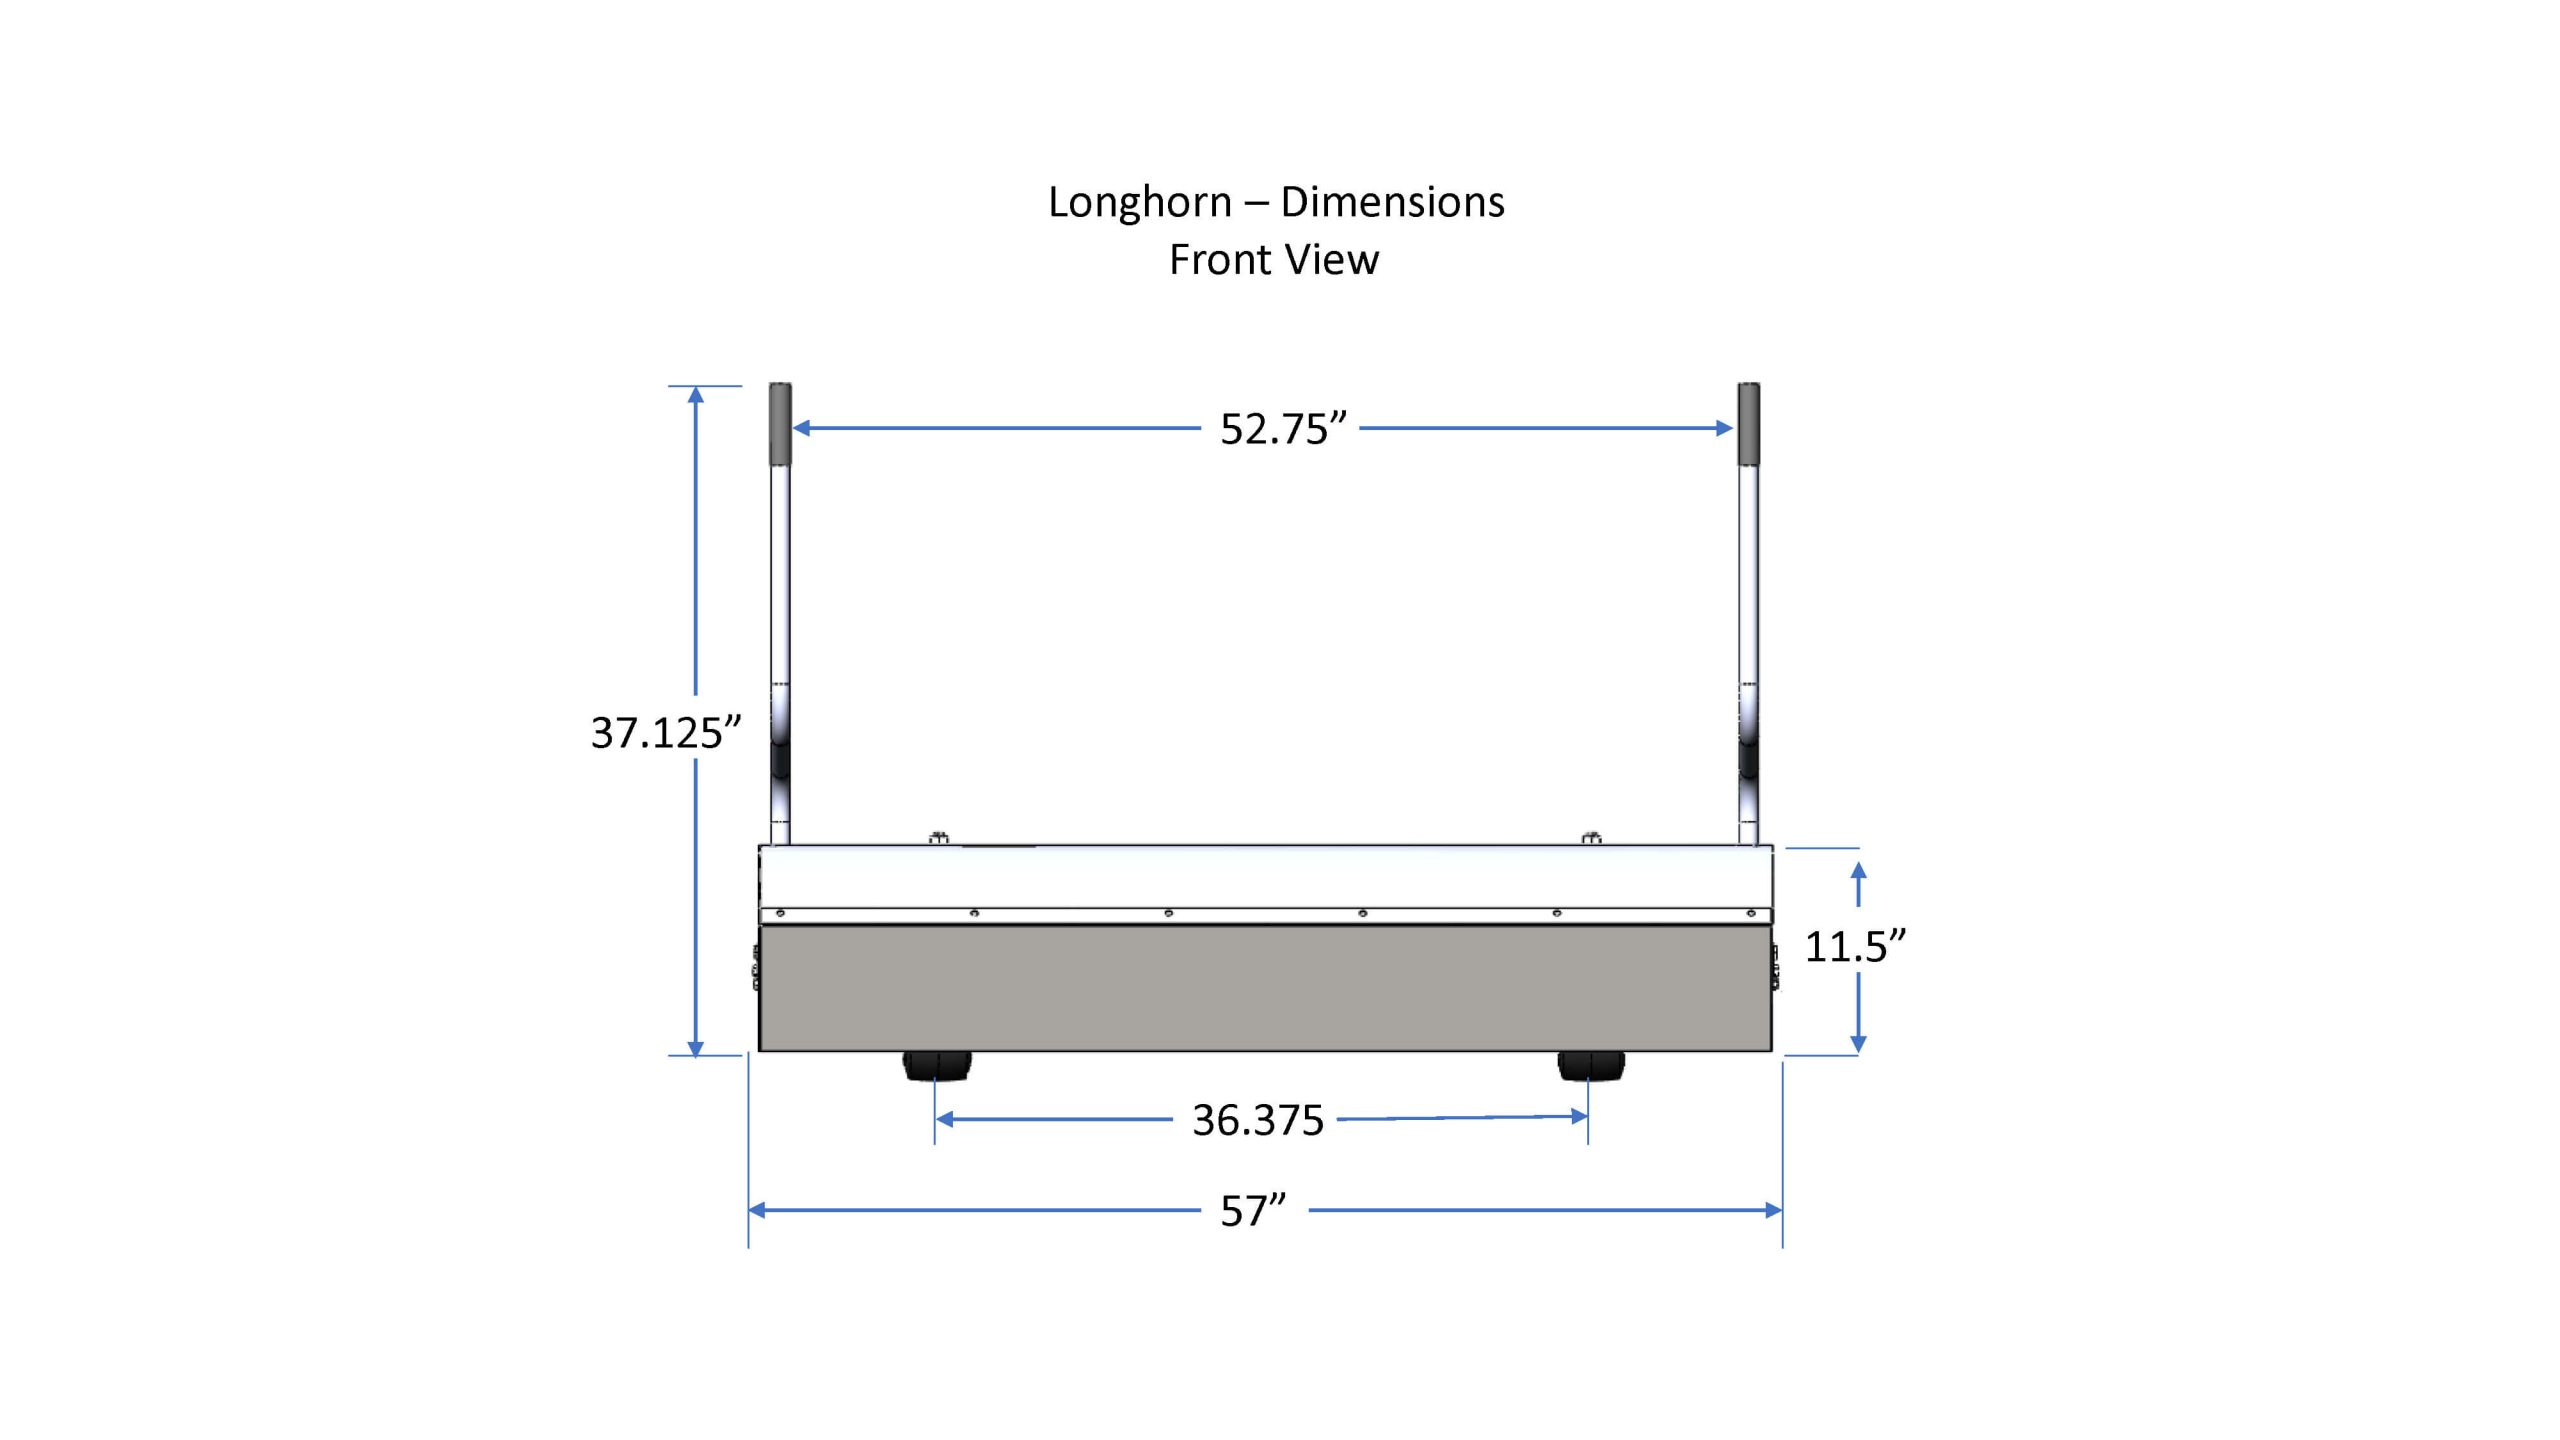 Longhorn_dimensions_front_view_bluestreakequipment